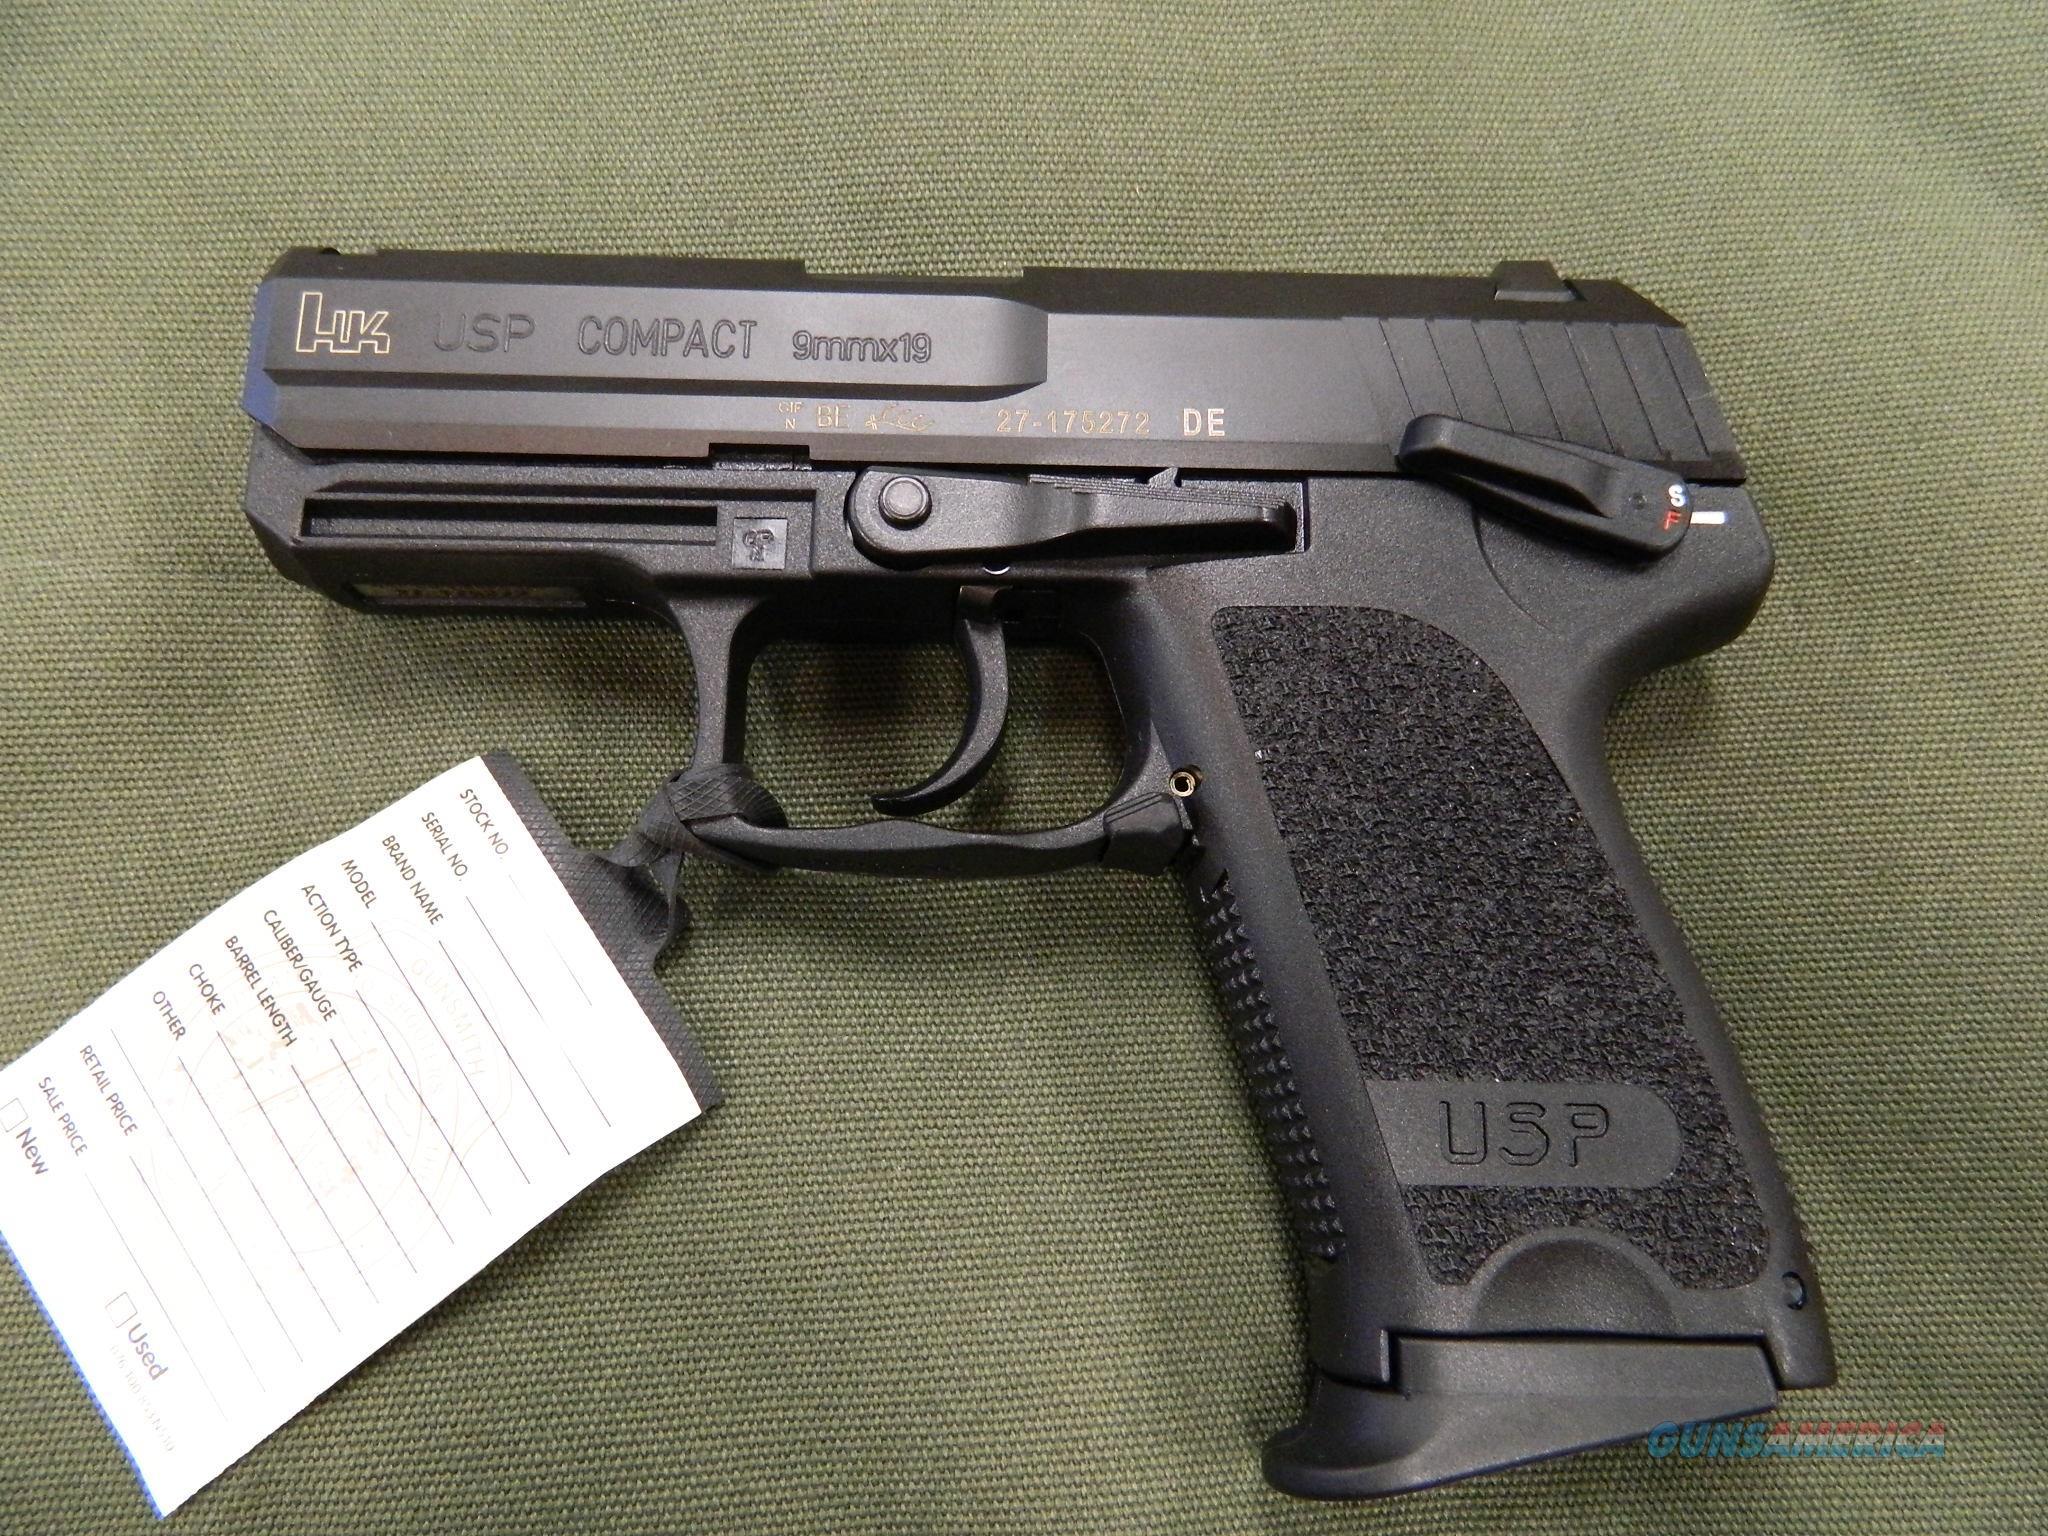 HK USP 9MM Compact NIB for sale